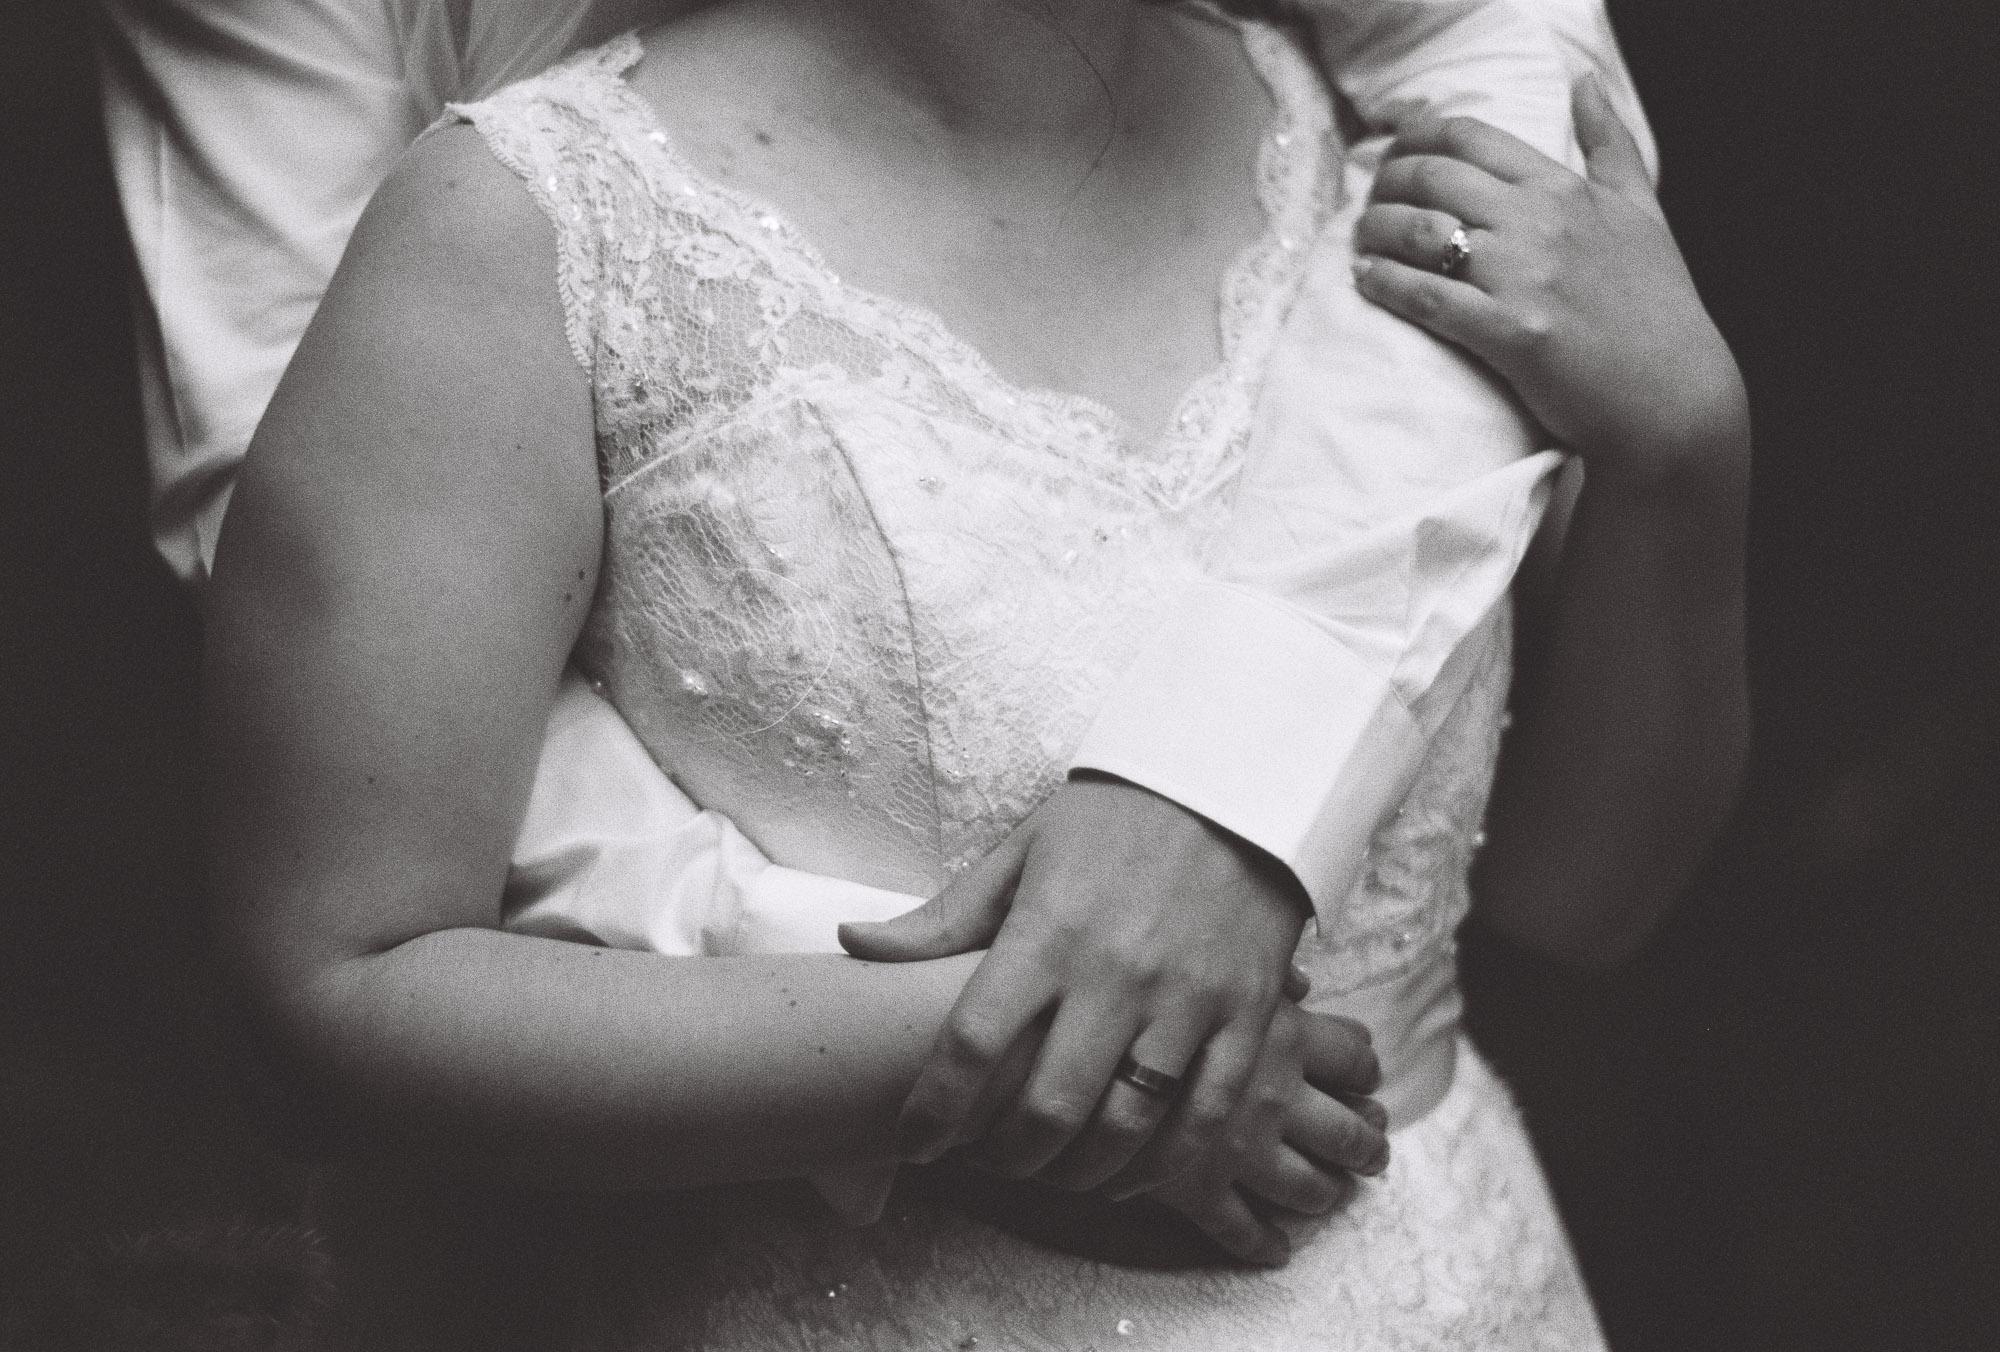 jere-satamo-analog-film-wedding-photographer-finland-090.jpg